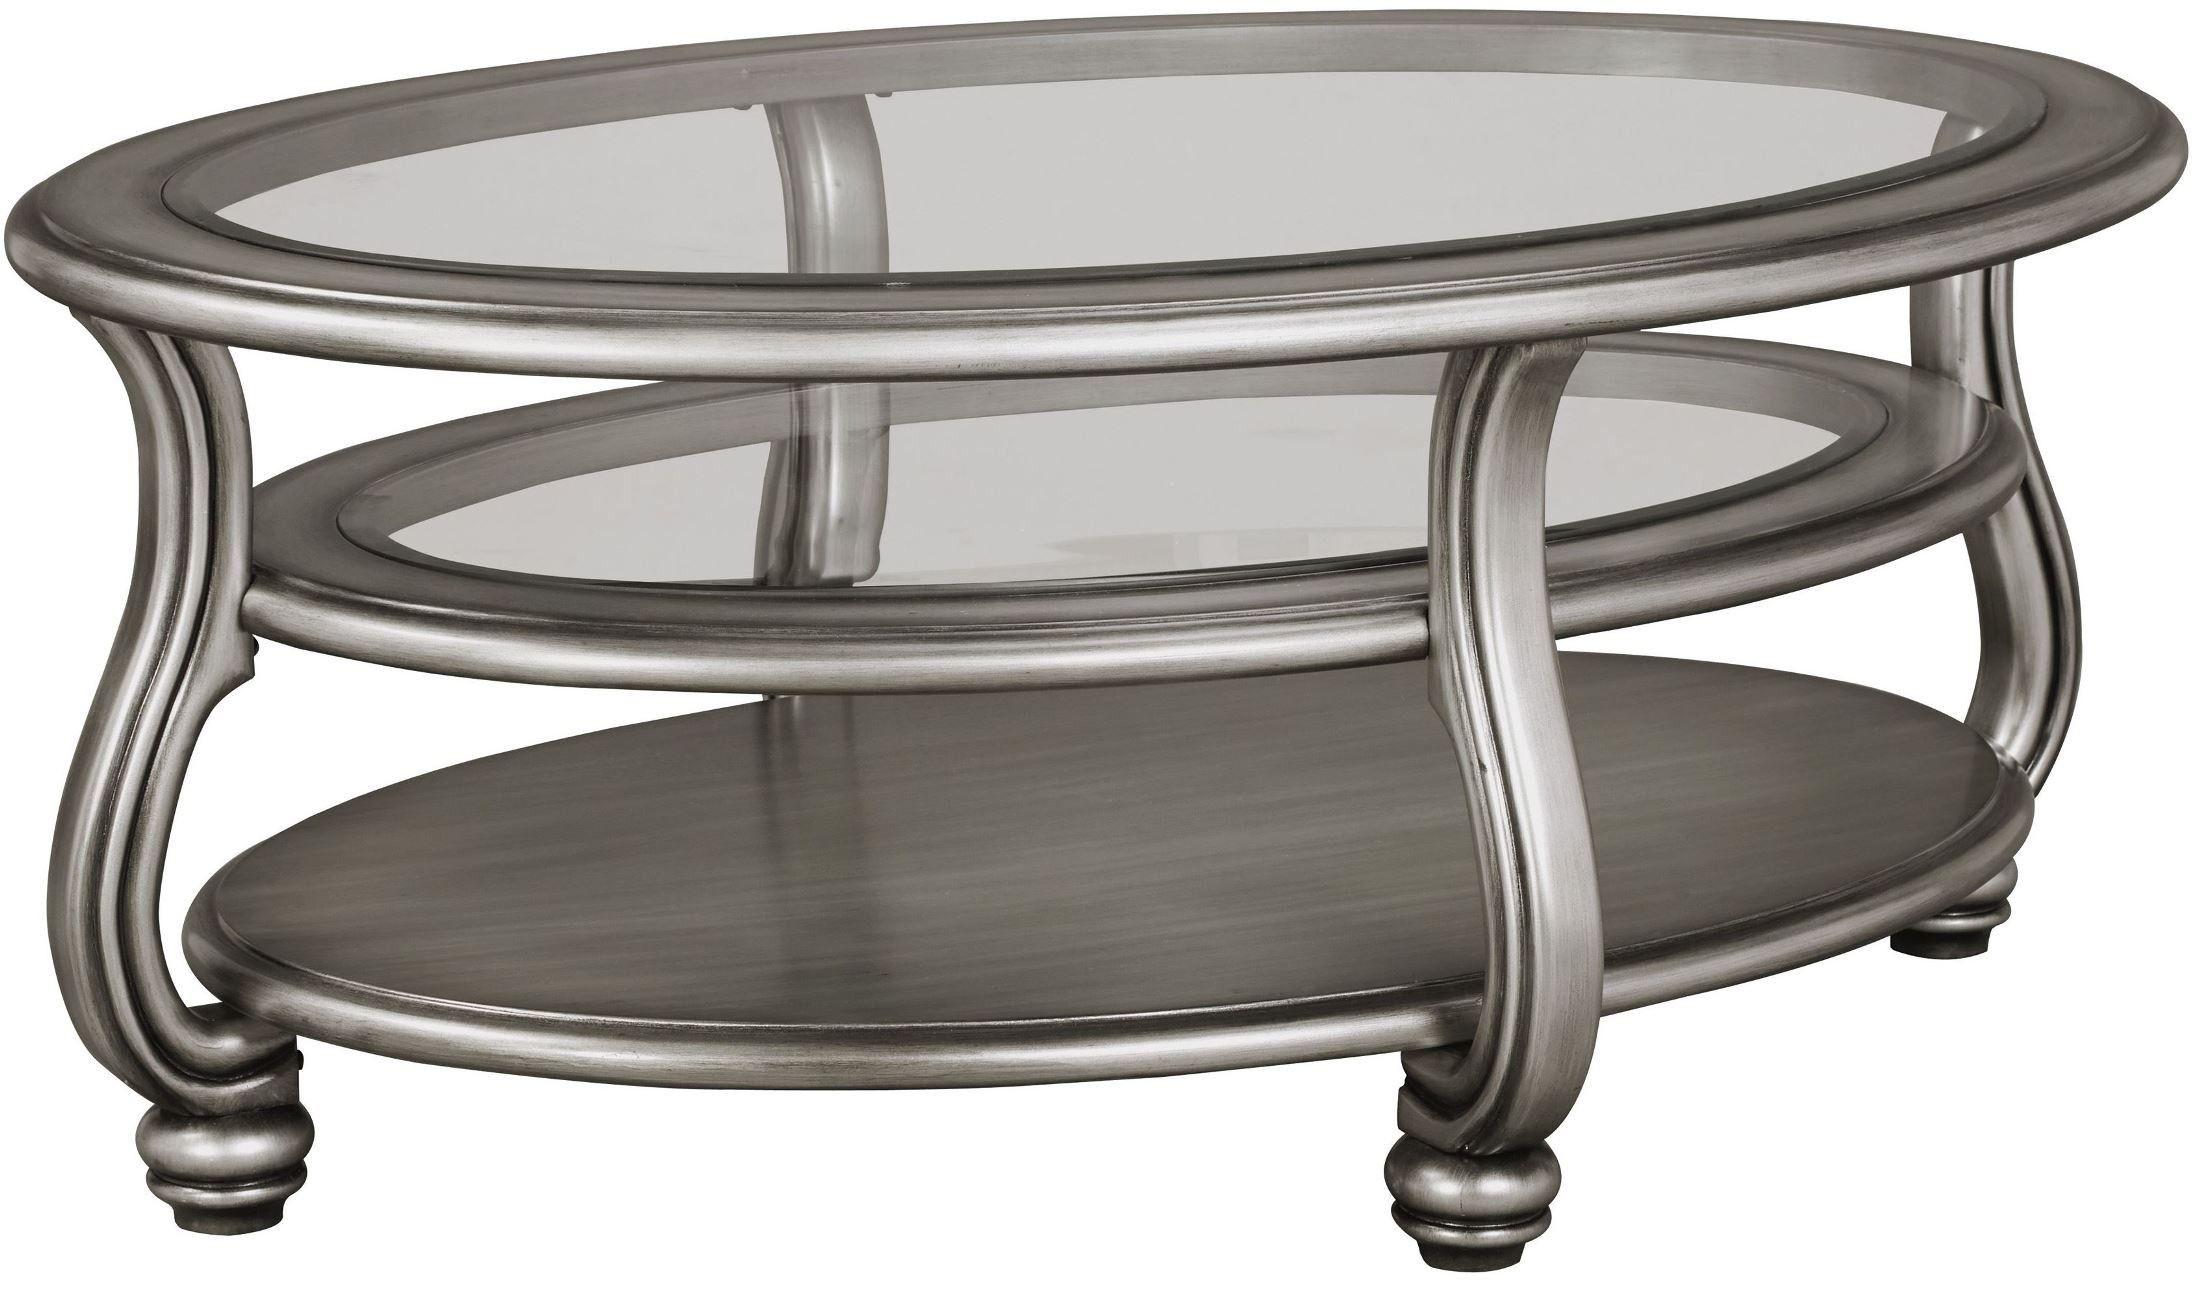 Coralayne Silver Oval Cocktail Table Овальные столики